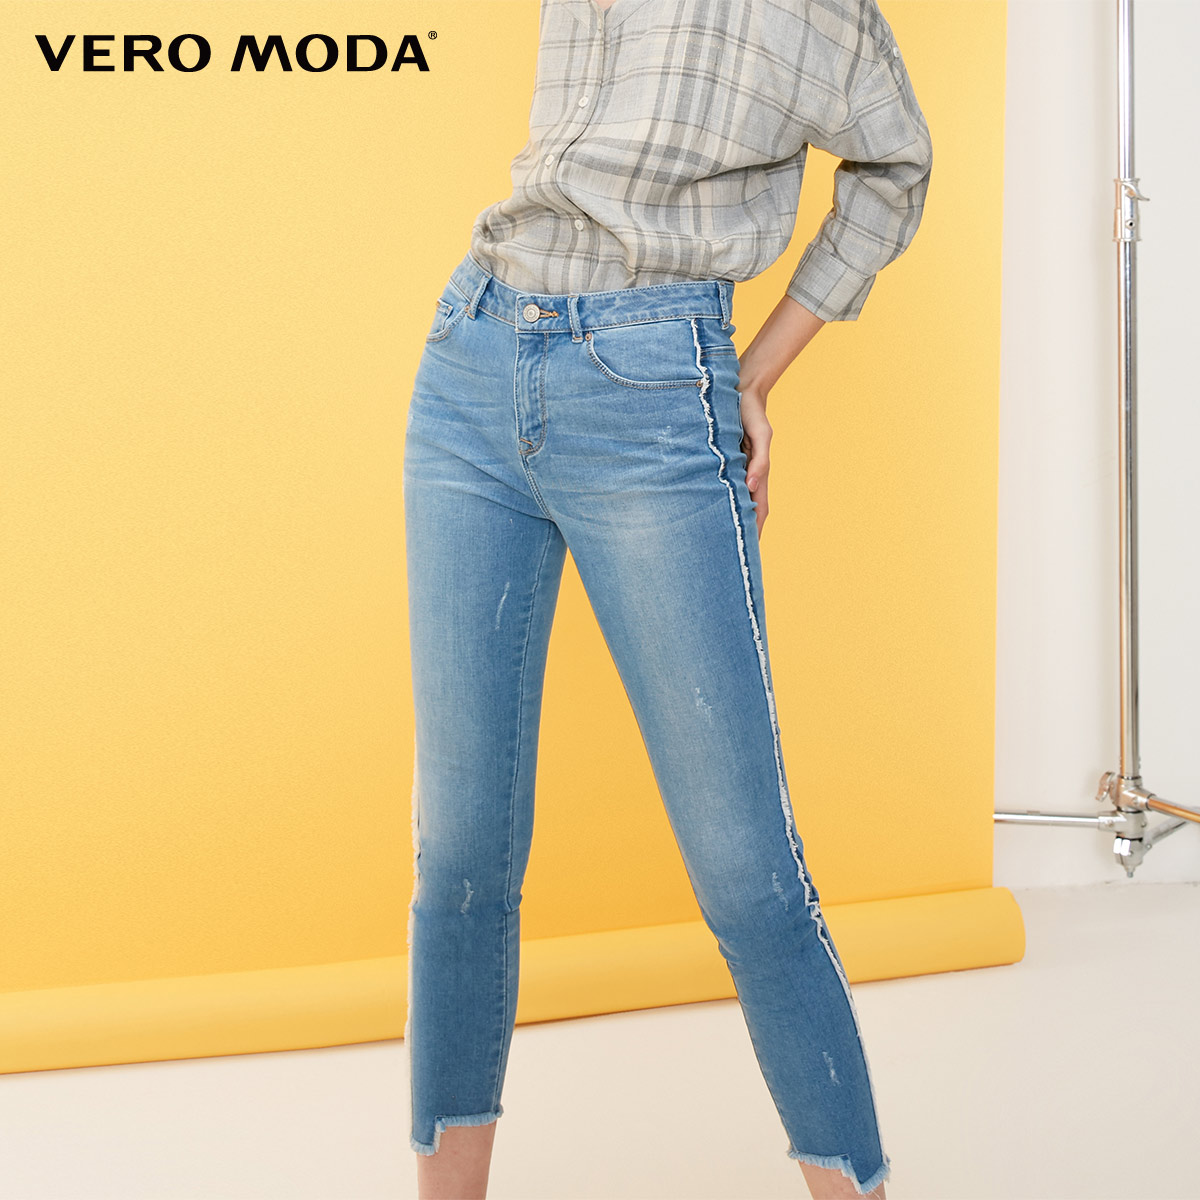 Vero Moda Women's Washed Distressed Raw-edge High Waist Slim Fit Jeans | 318349580